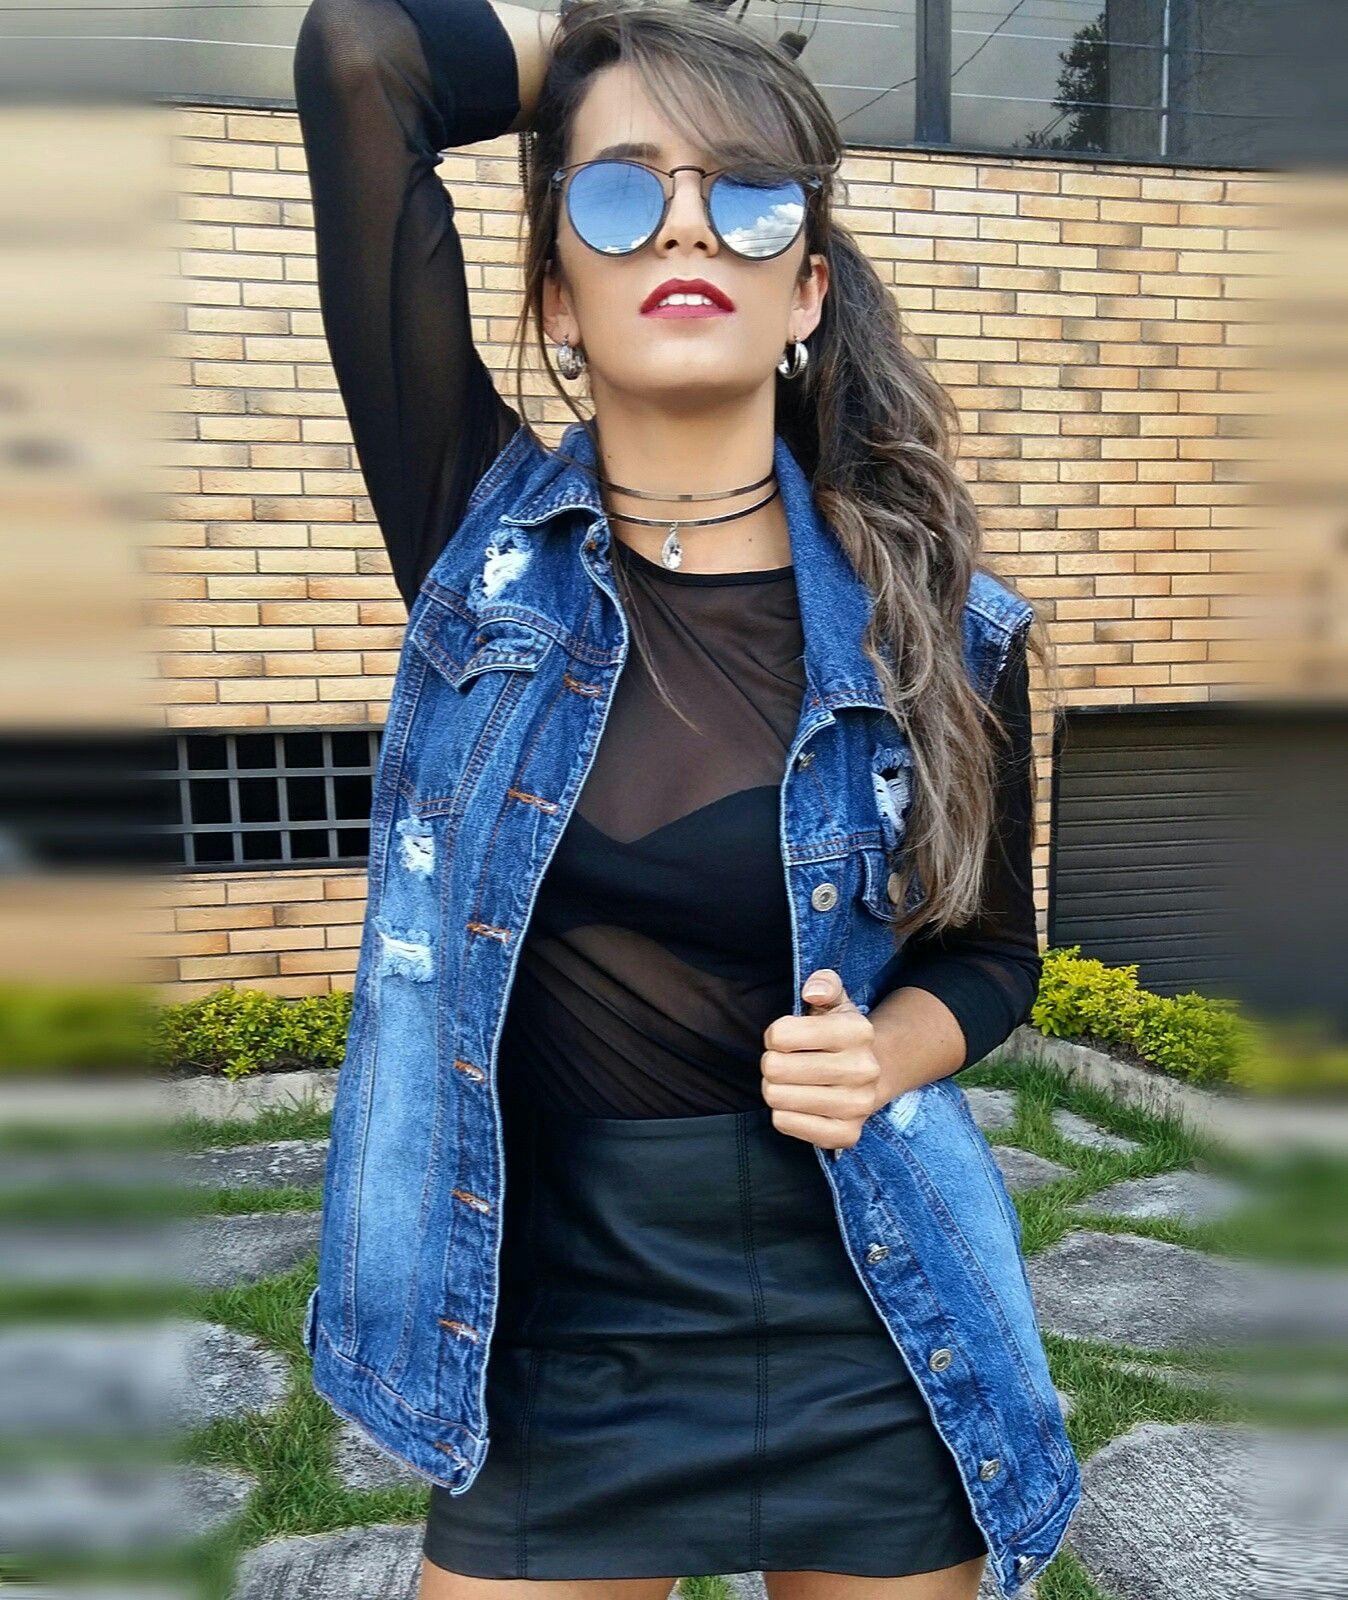 677f155a5 Look: Maxi colete jeans lady rock, blusa transparente preta, saia de couro.  Acessórios: choker, óculos escuros